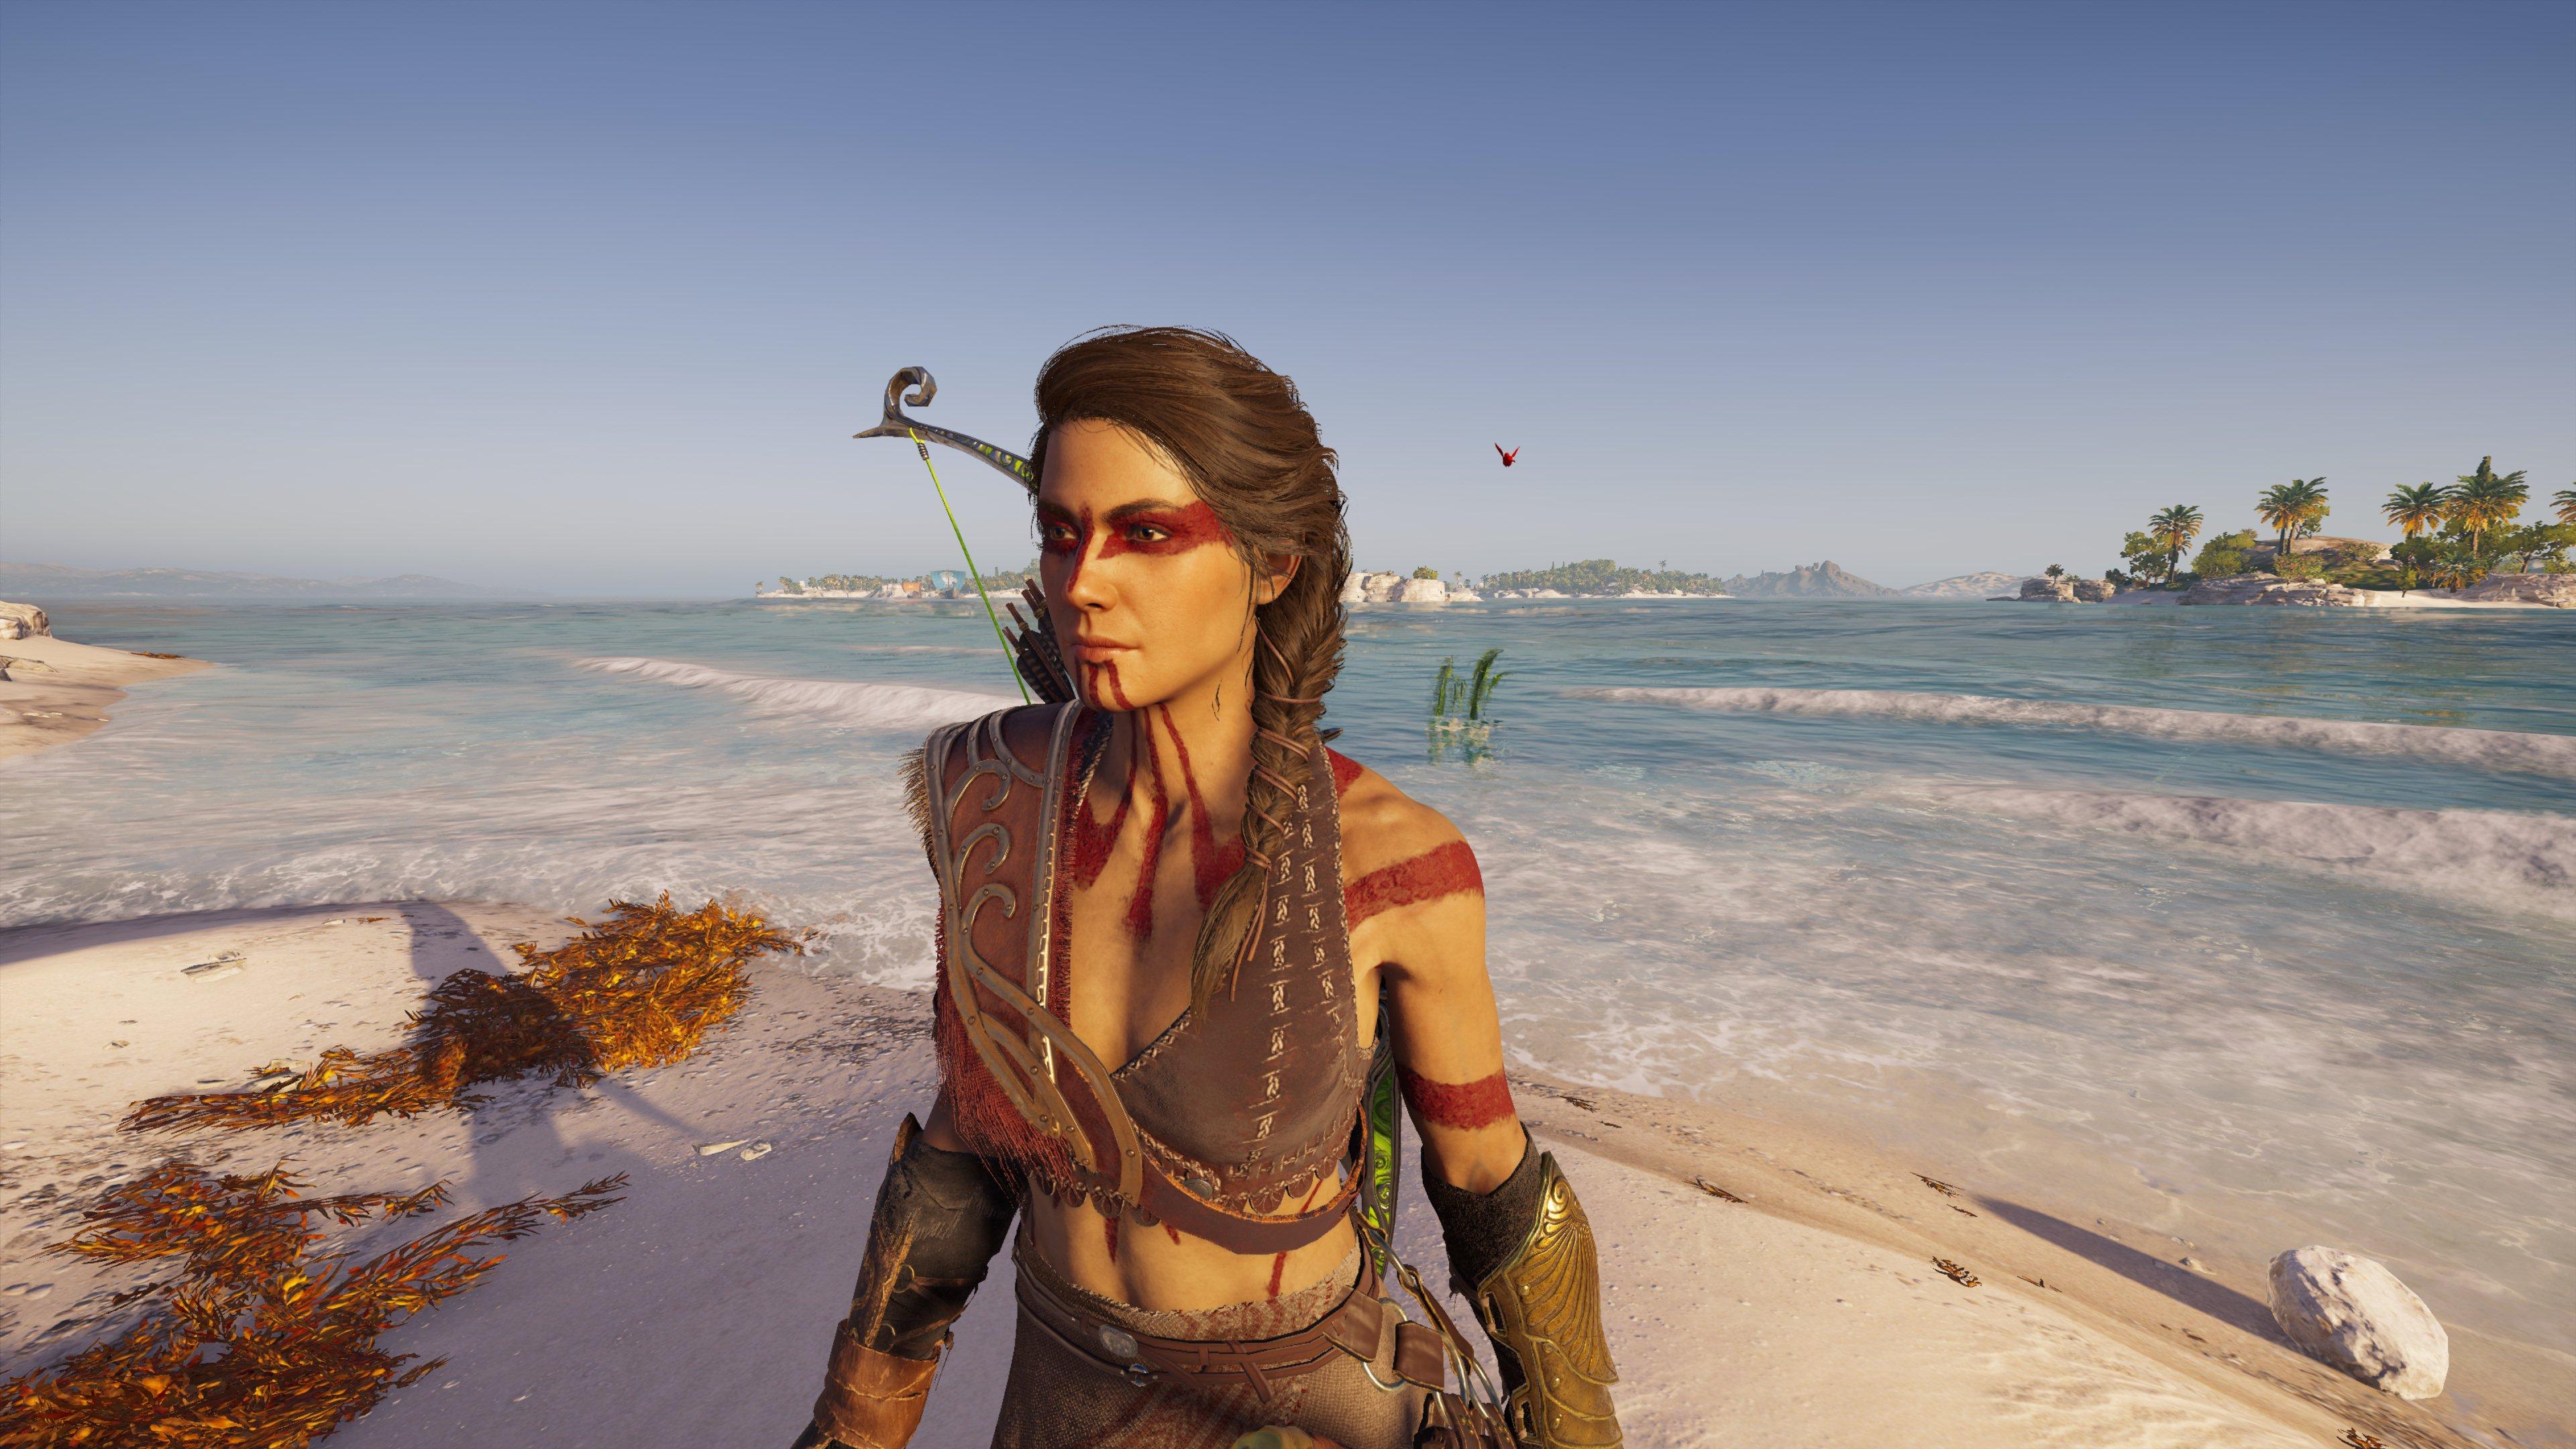 2018116150039.jpg - Assassin's Creed: Odyssey